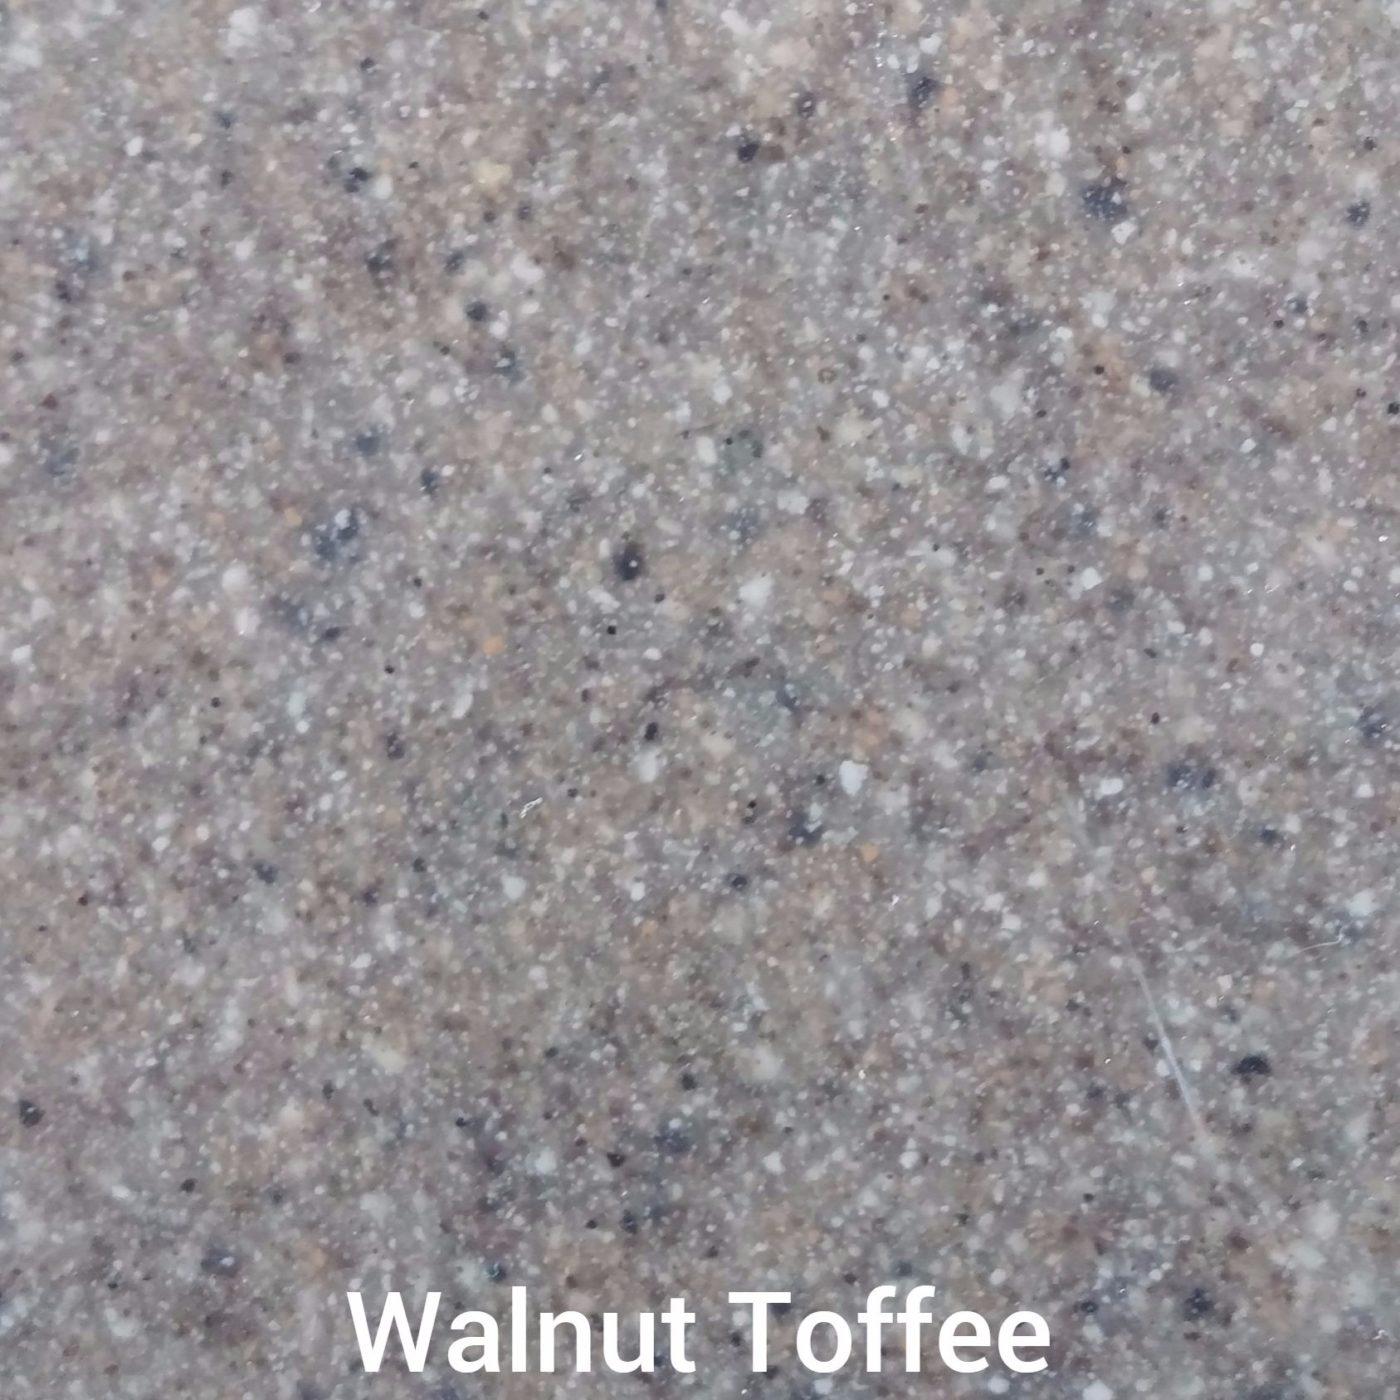 Wlanut Toffee